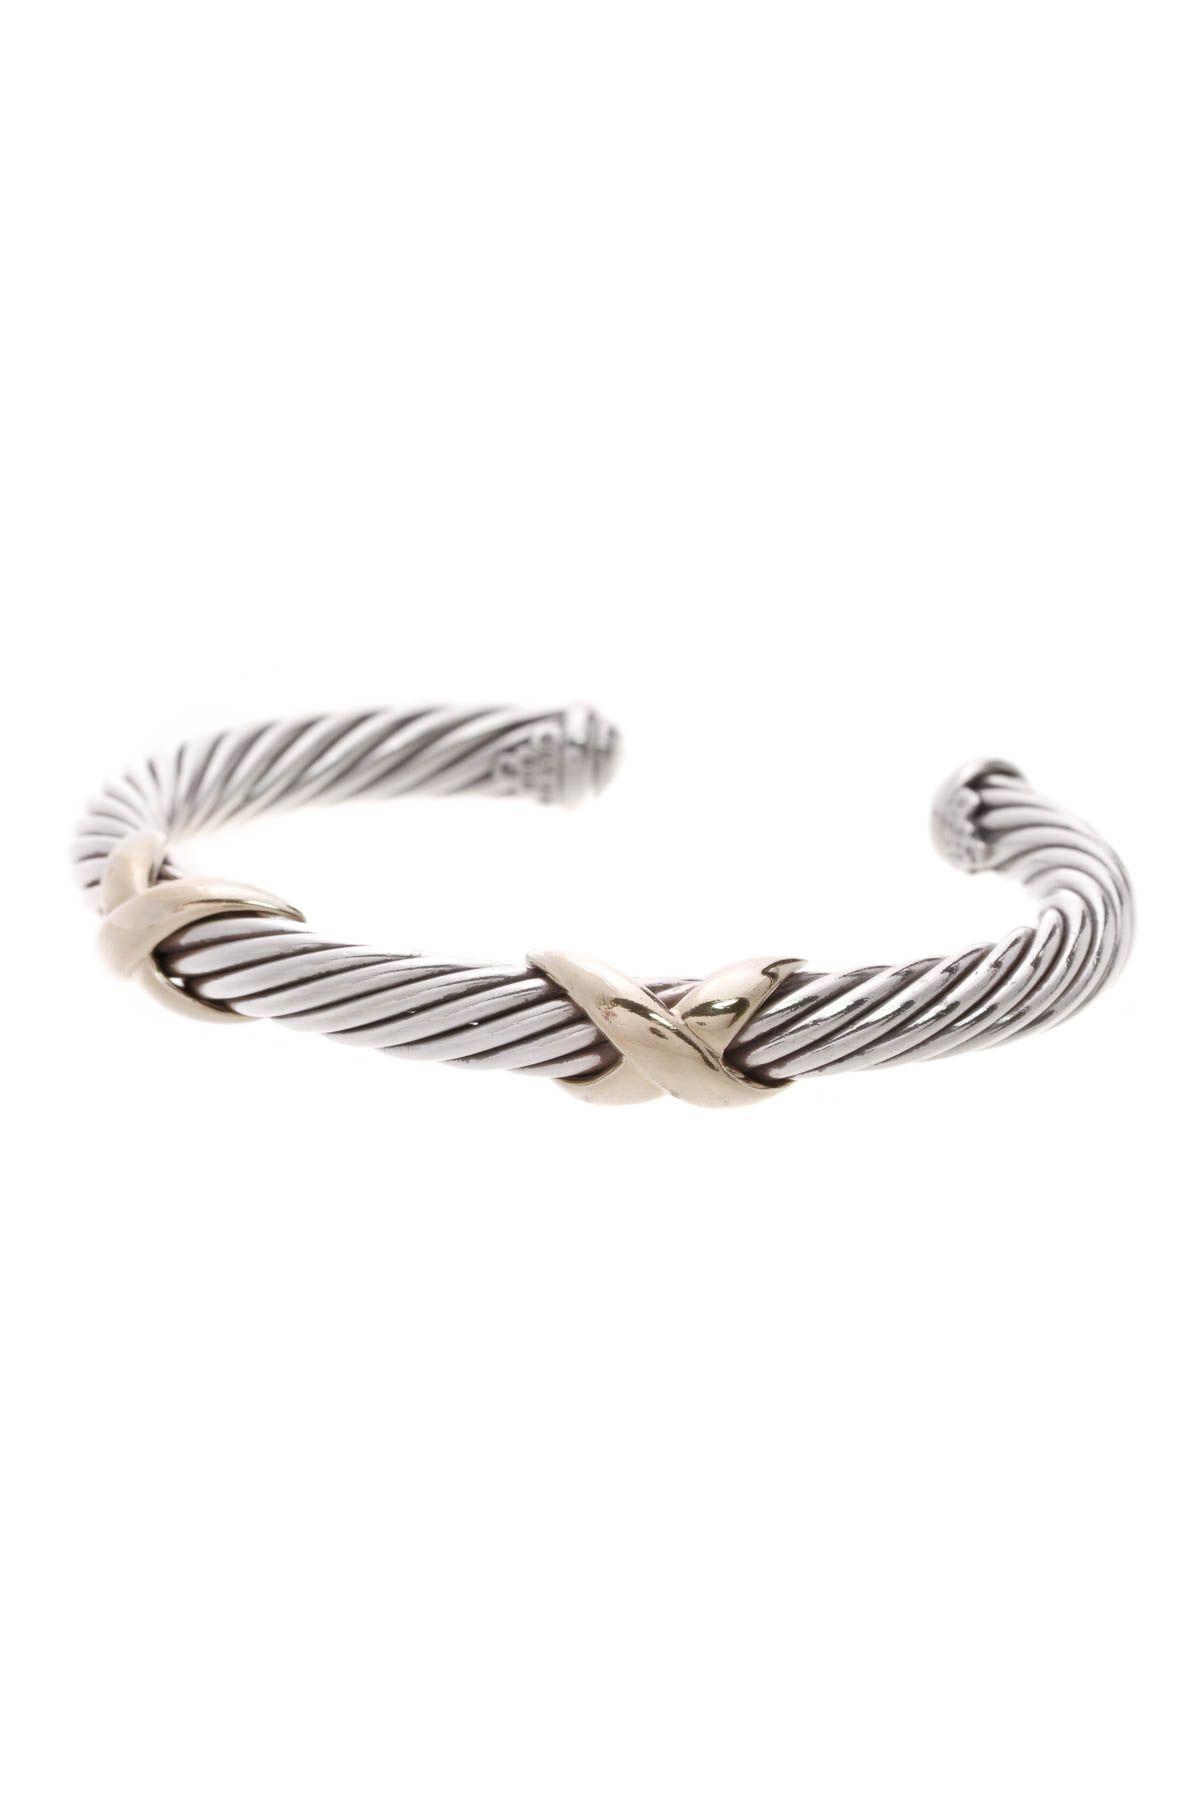 David Yurman Double X Cable Bracelet